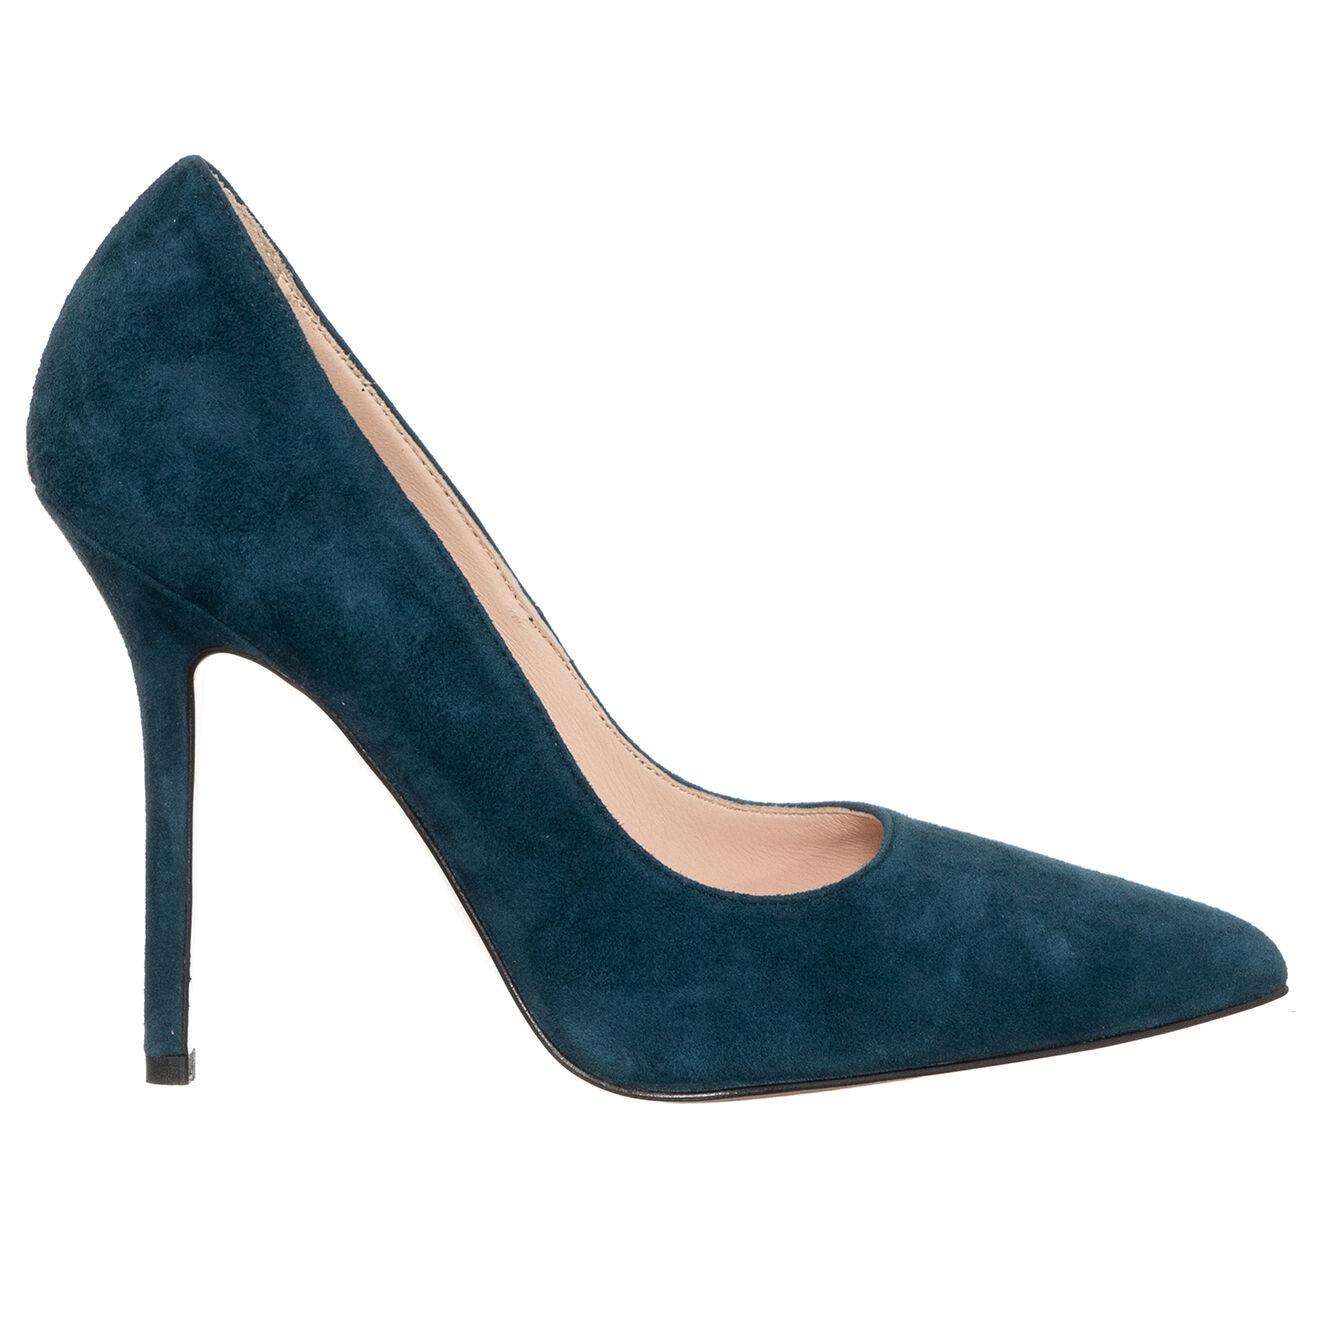 Escarpins en Velours de Cuir Marilyn bleus - Talon 10 cm - Liu-Jo - Modalova